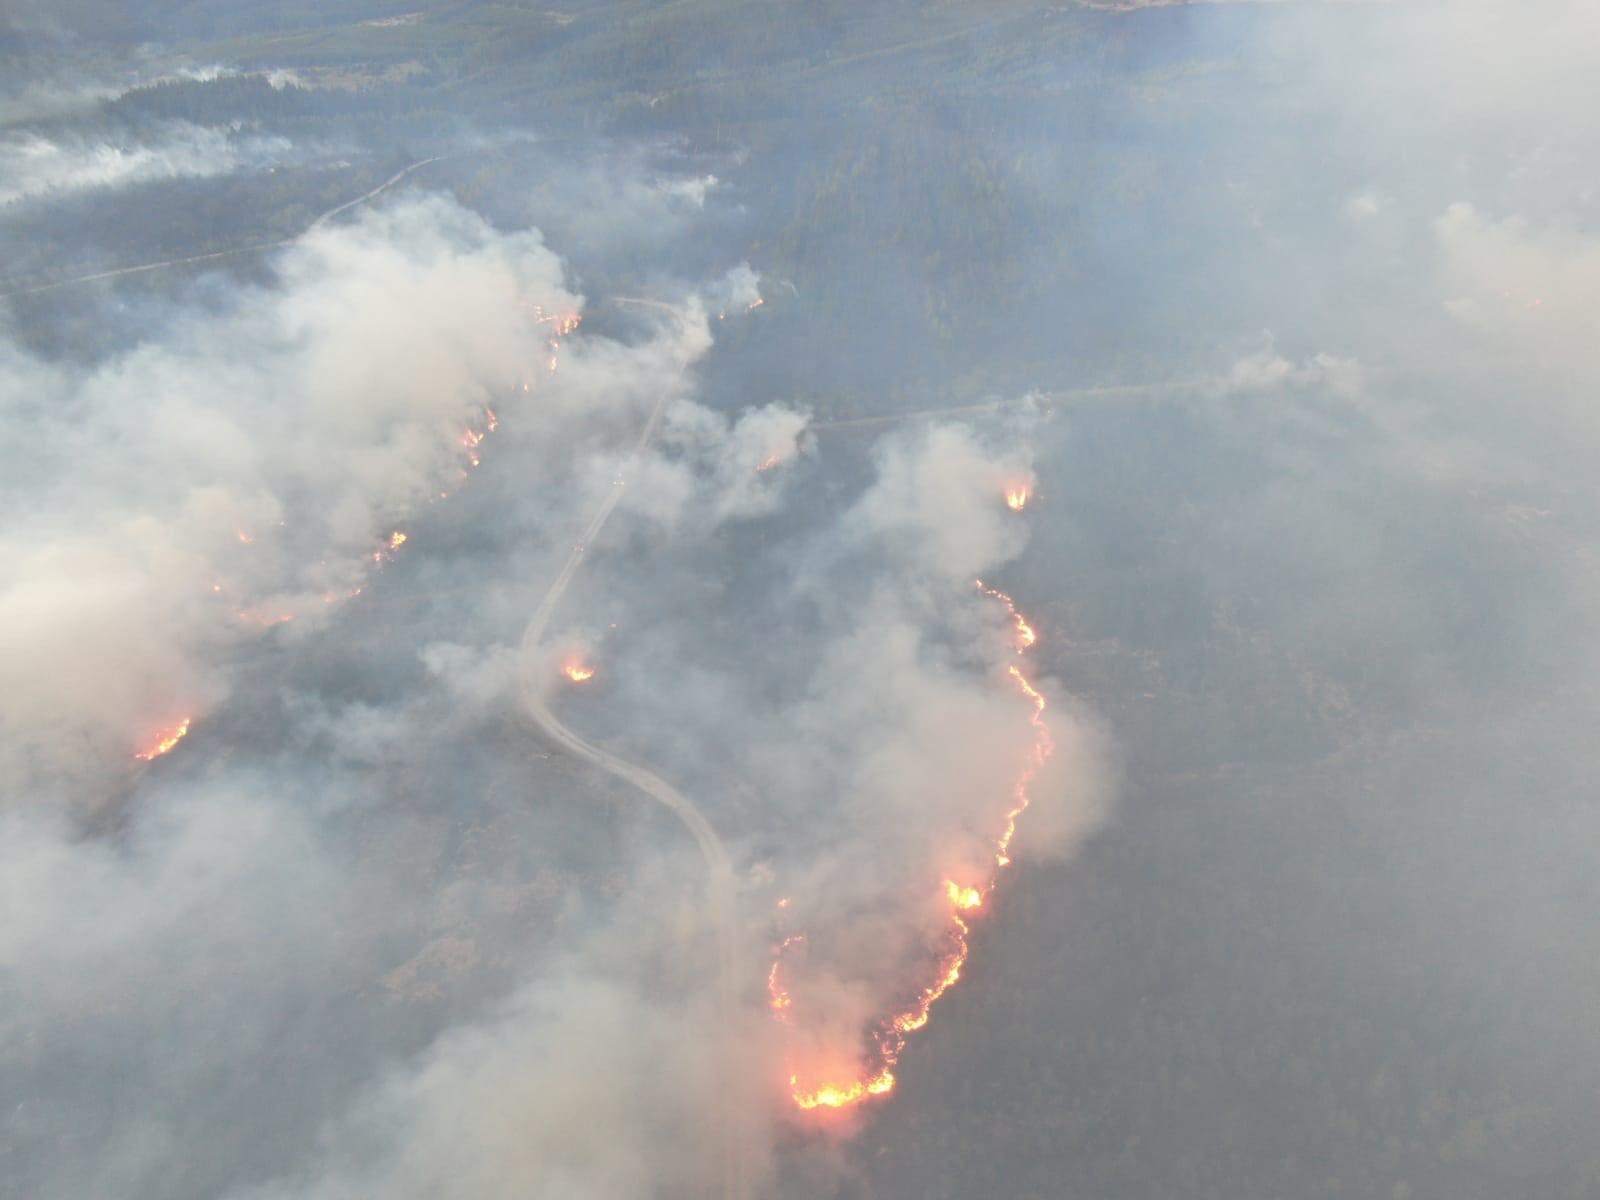 Aerila picture of Ballinamore forest fire